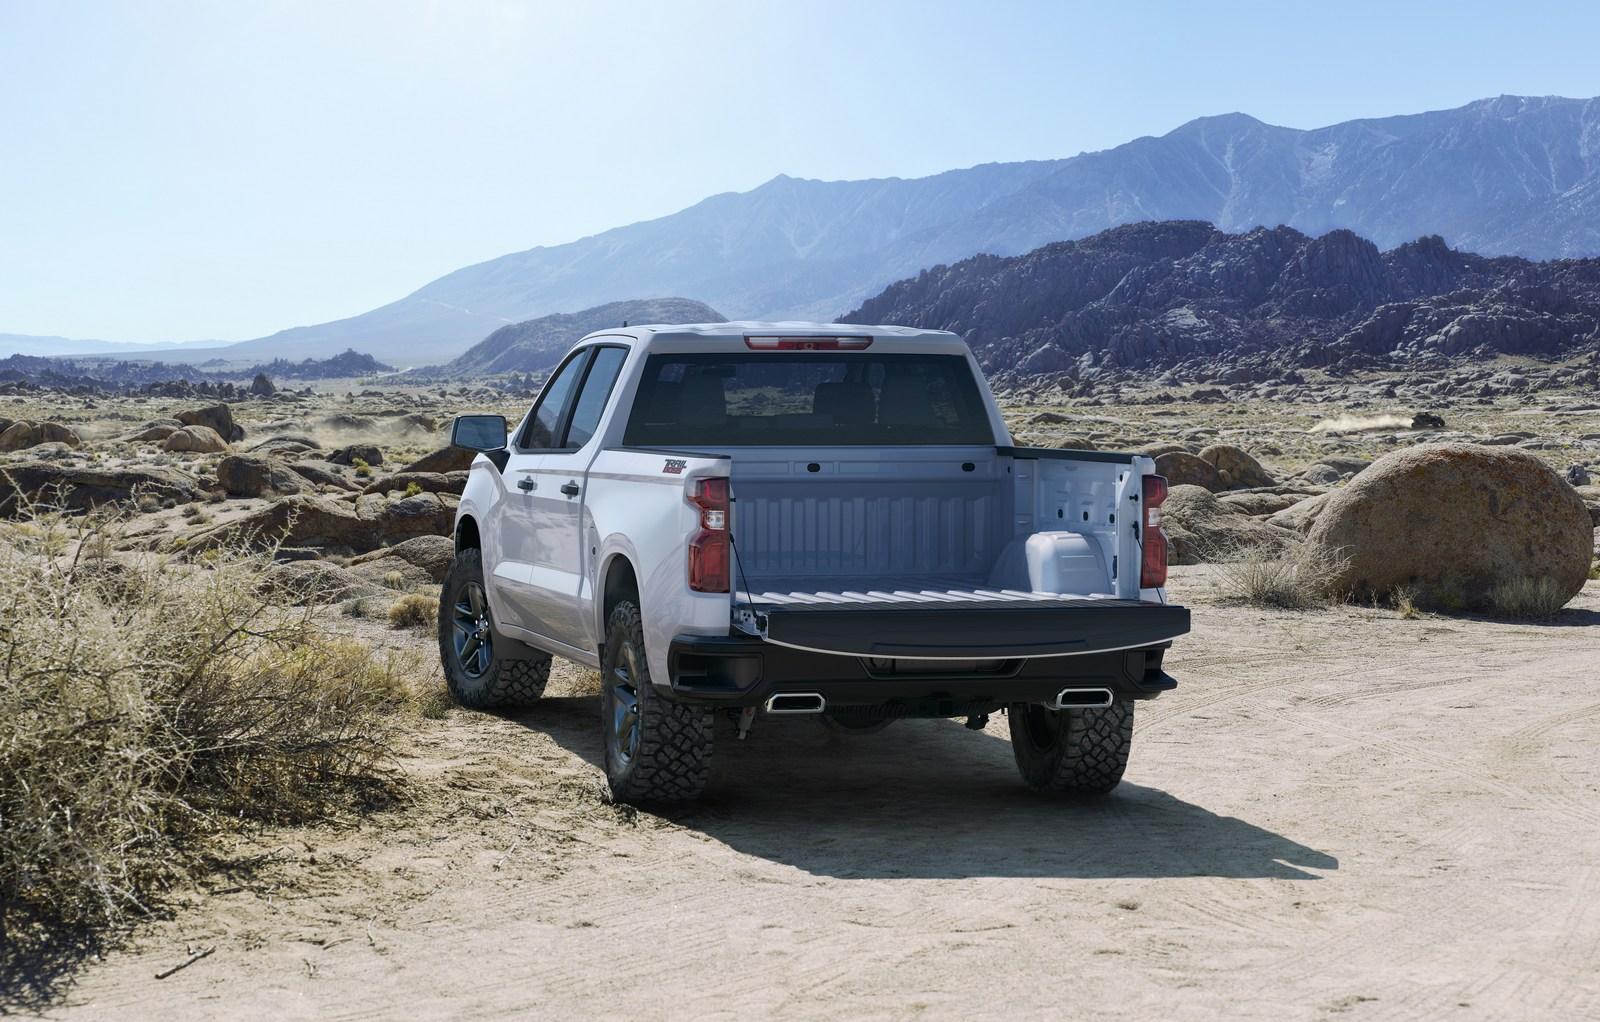 2020 Chevrolet Silverado HD Looks Massive In First Teaser ...